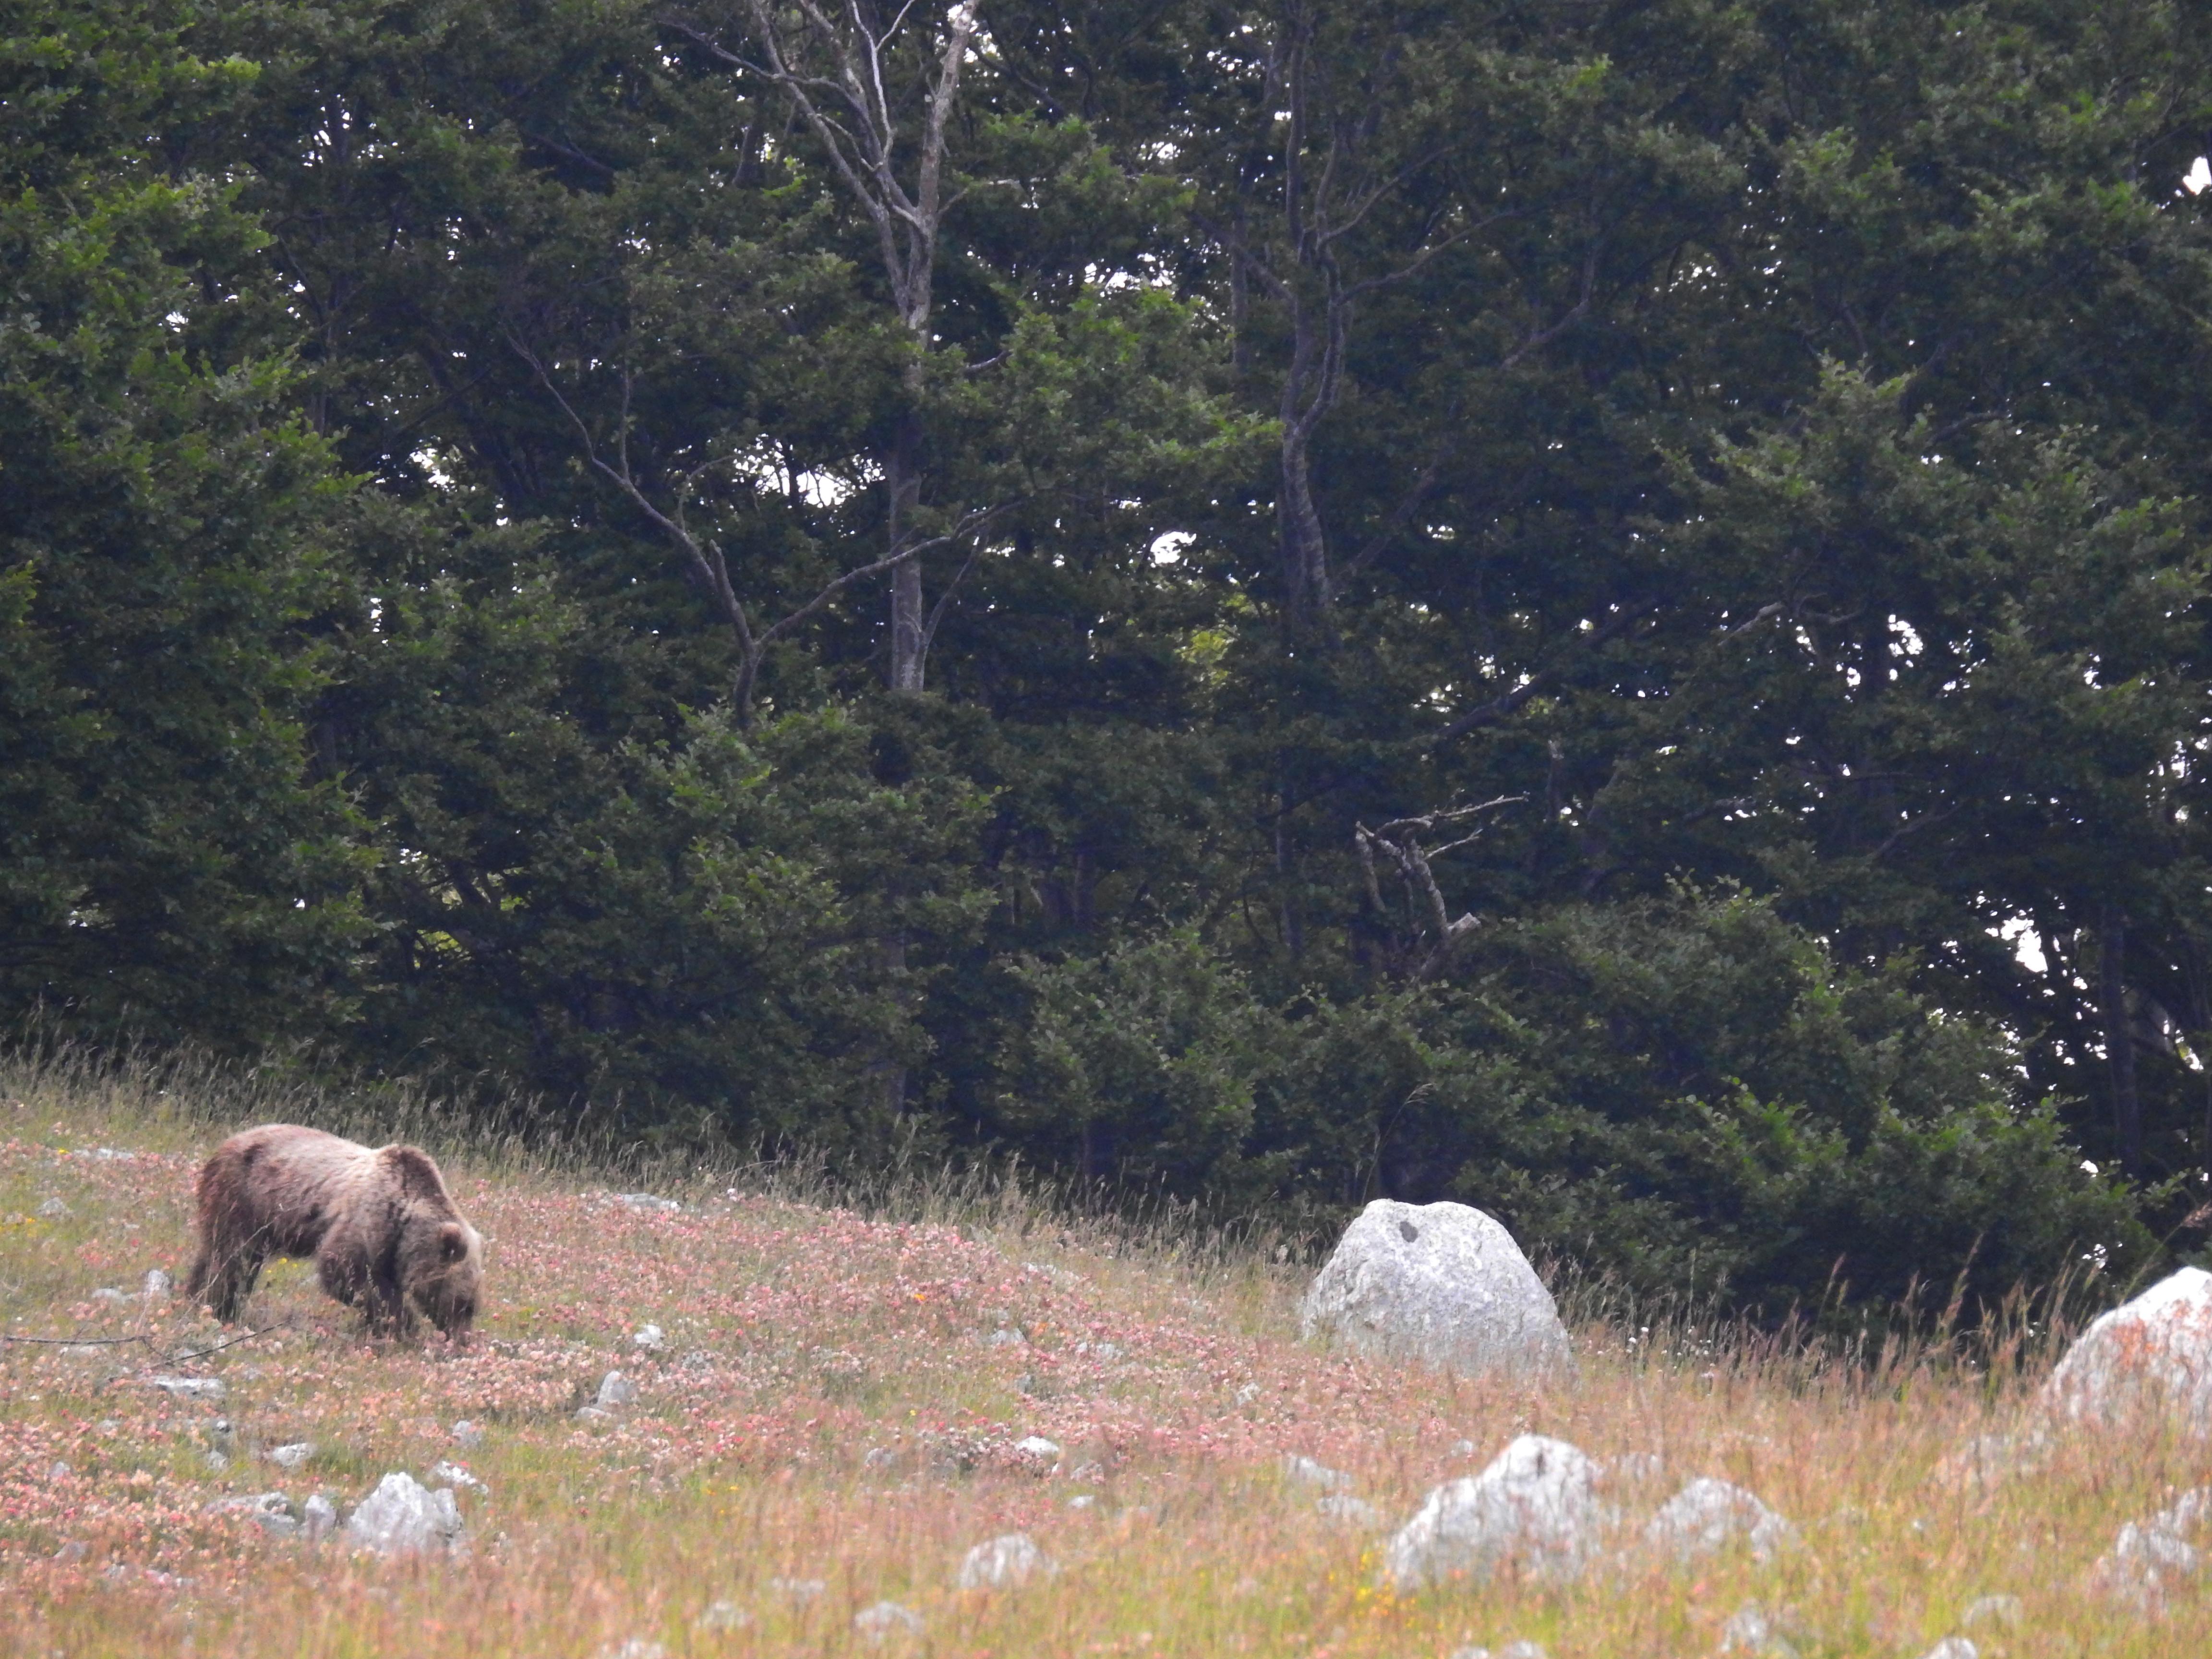 Marsican brown bear (Ursus arctos marsicanus)